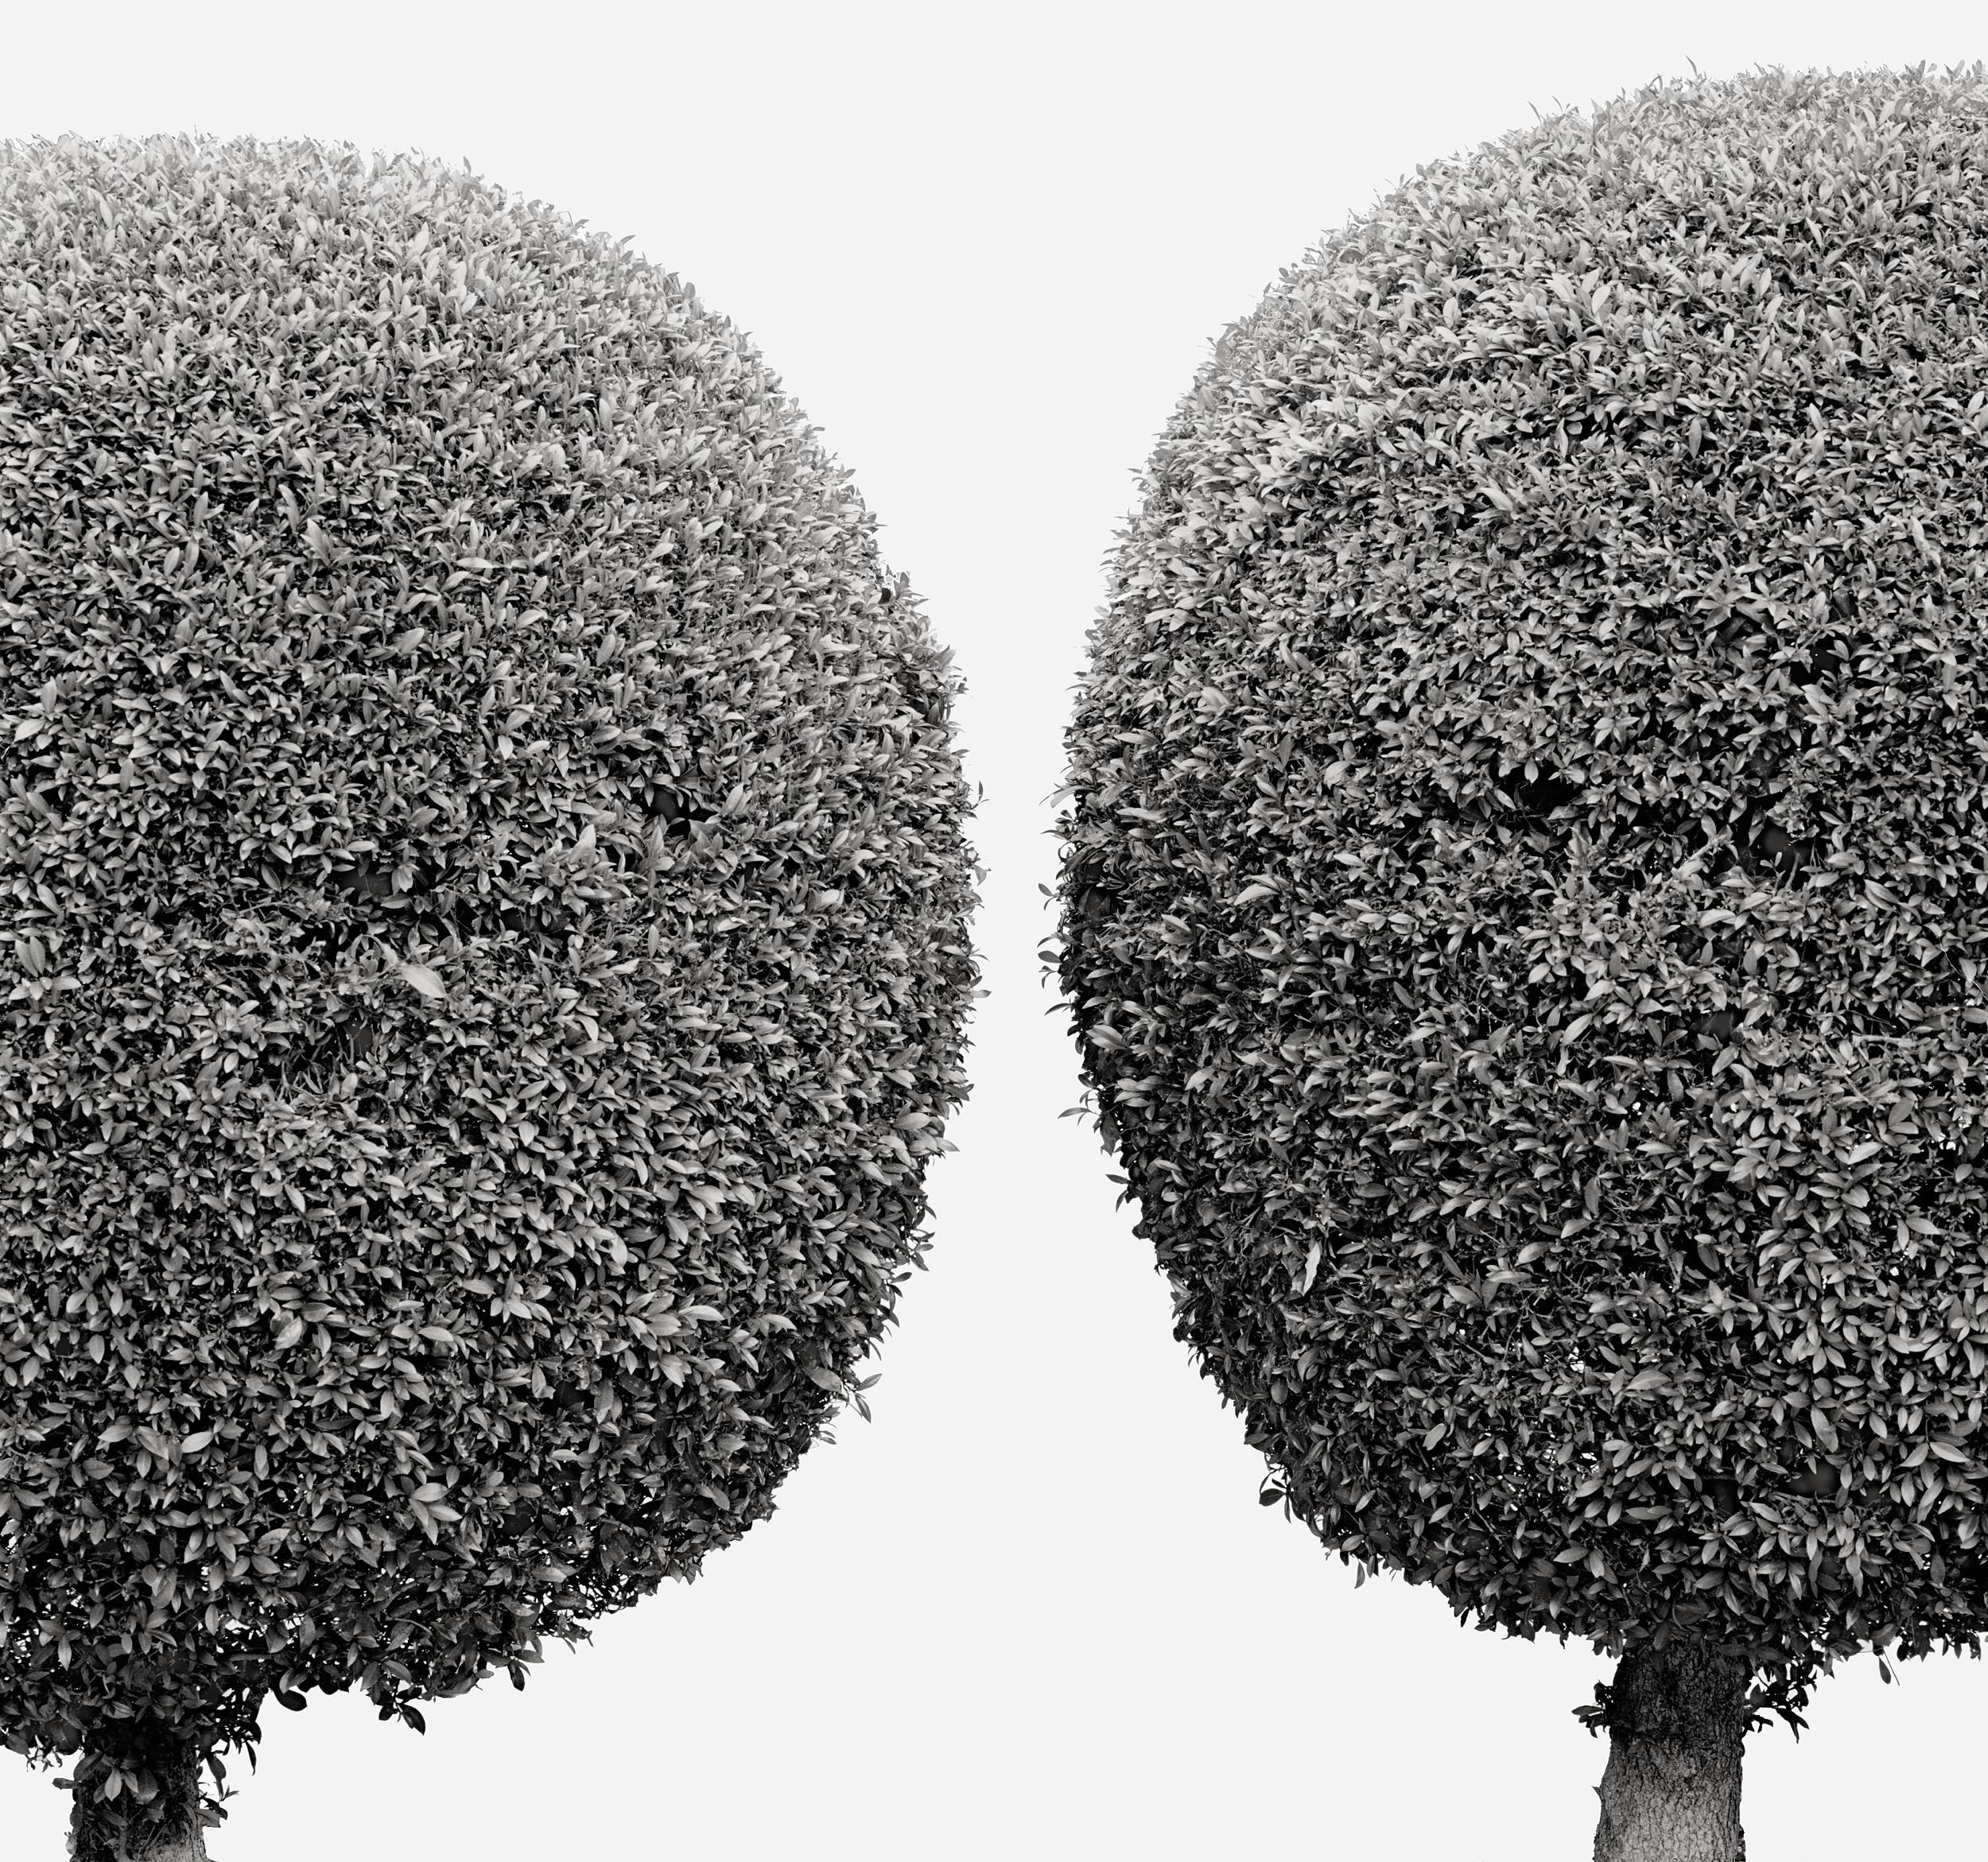 Arboreal Geometry #3, 2001